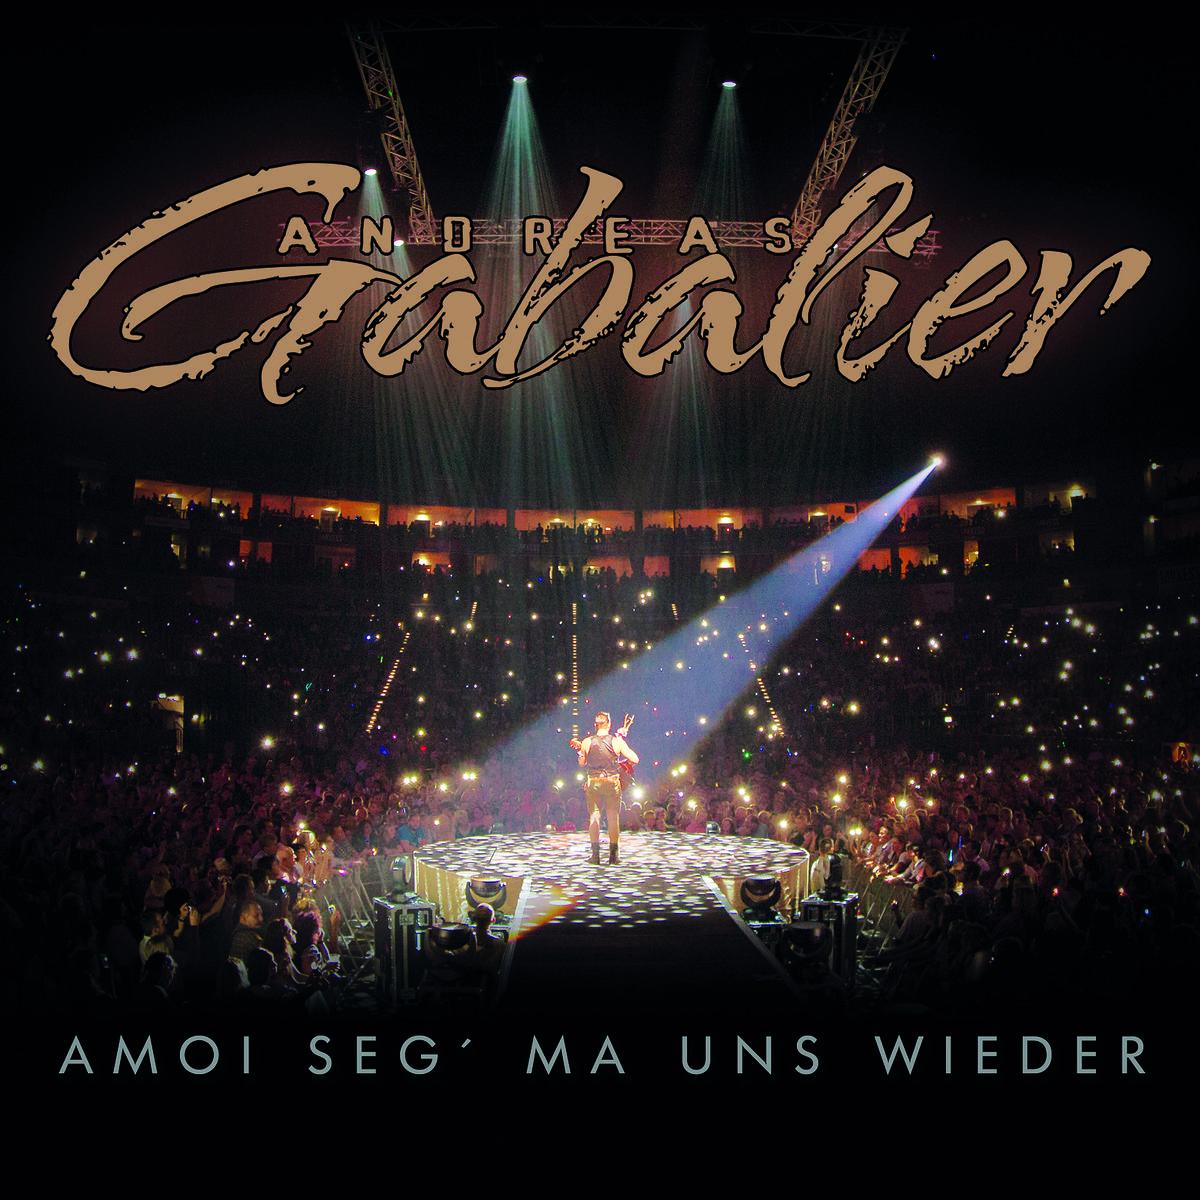 Andreas Gabalier – Amoi seg' ma uns wieder